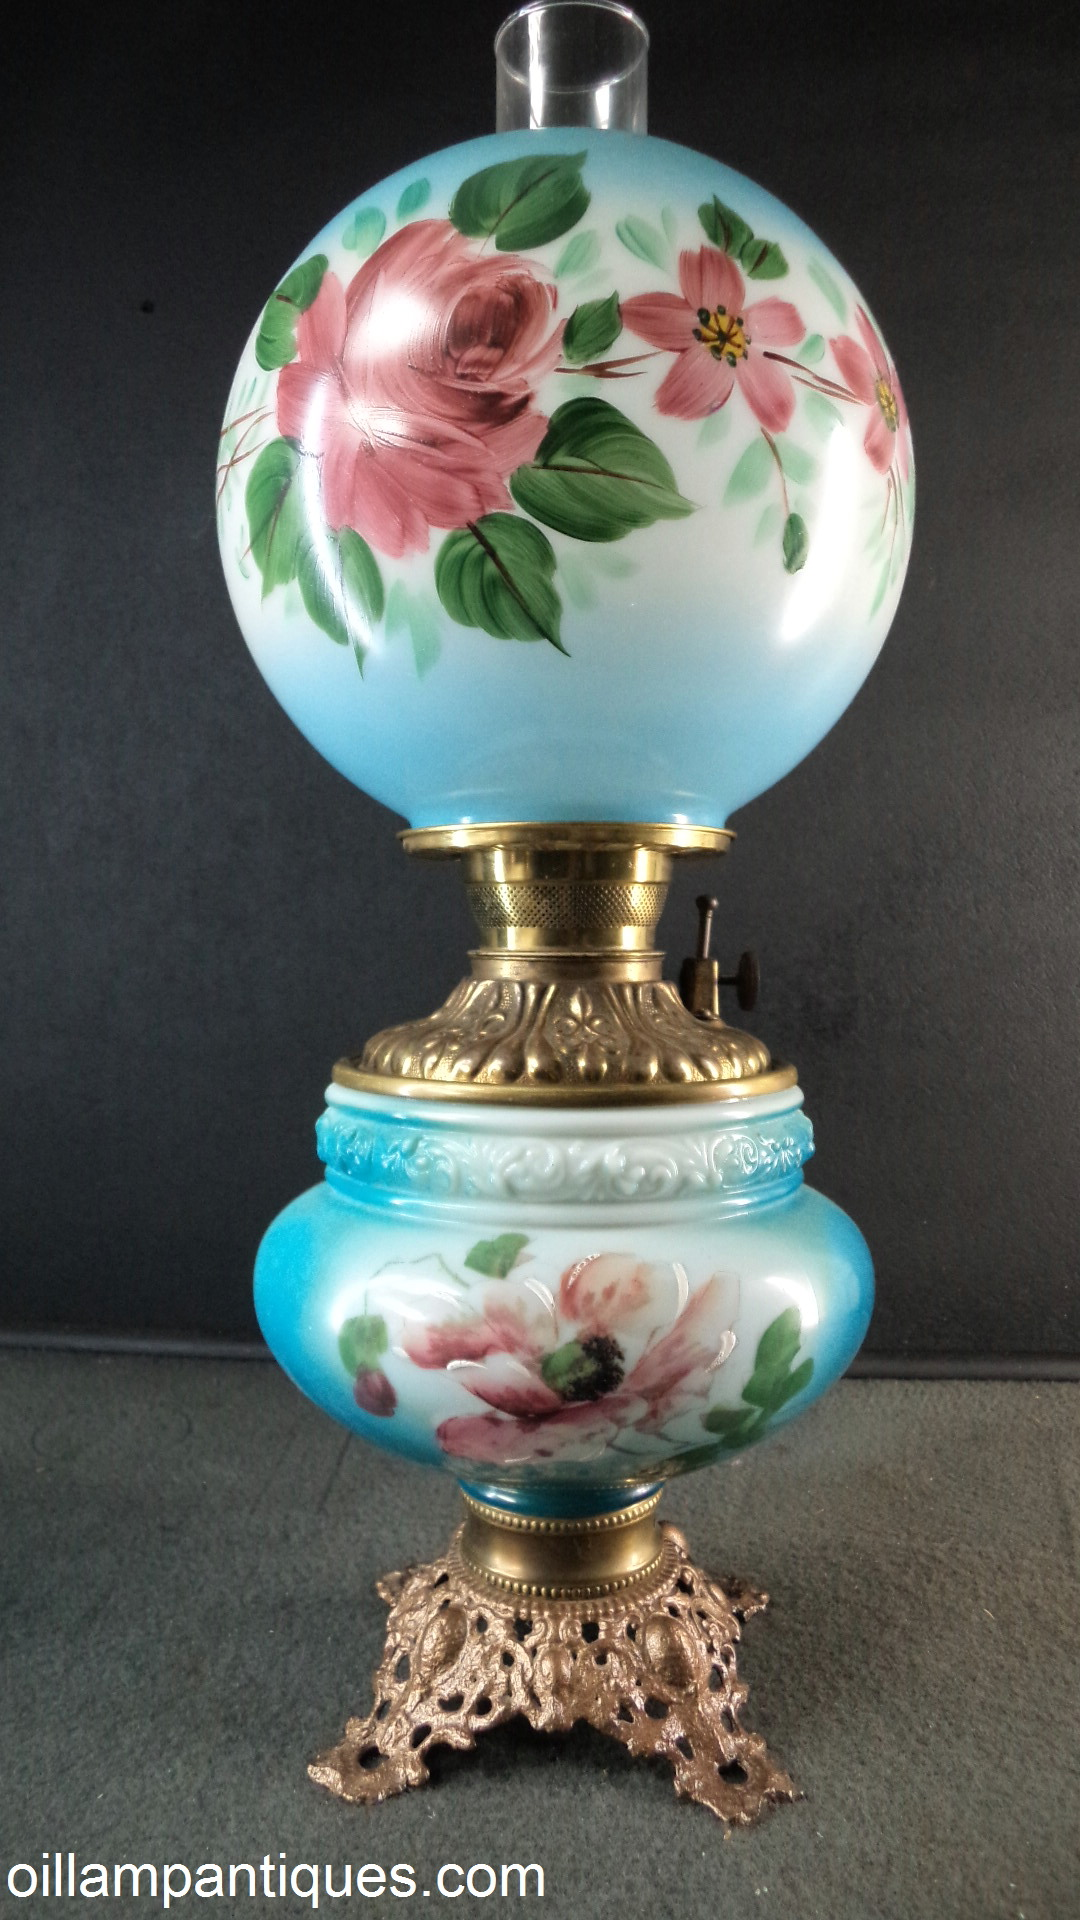 Parlor Oil Lamps Kerosene Lamps Oil Lamp Antiques